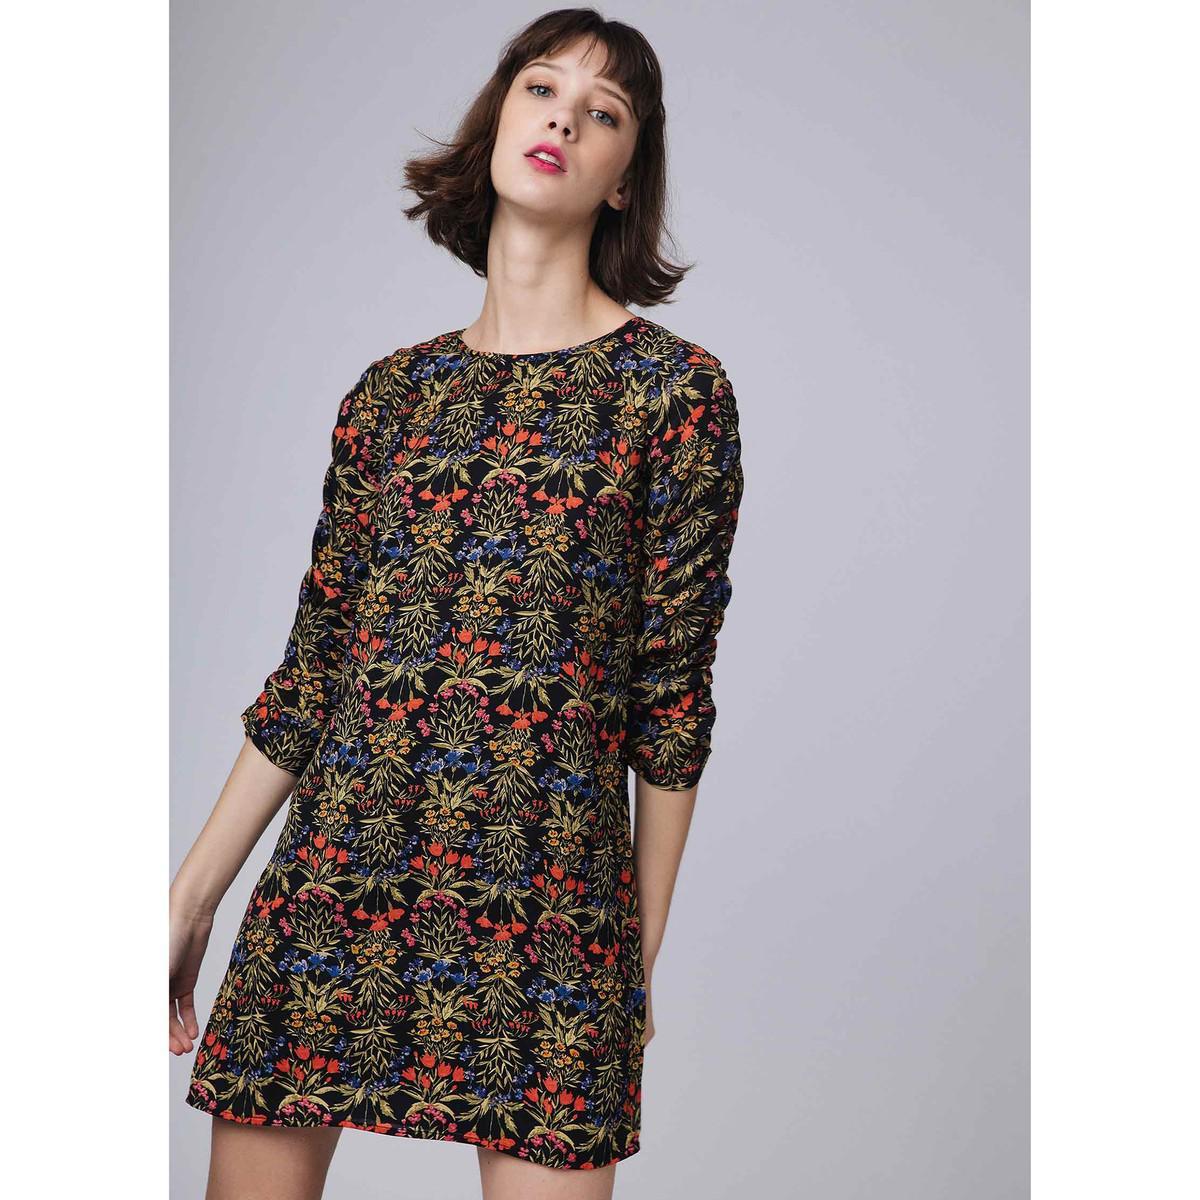 333b4e767d Compañía Fantástica. Women s Black Short Floral Print Straight Dress ...